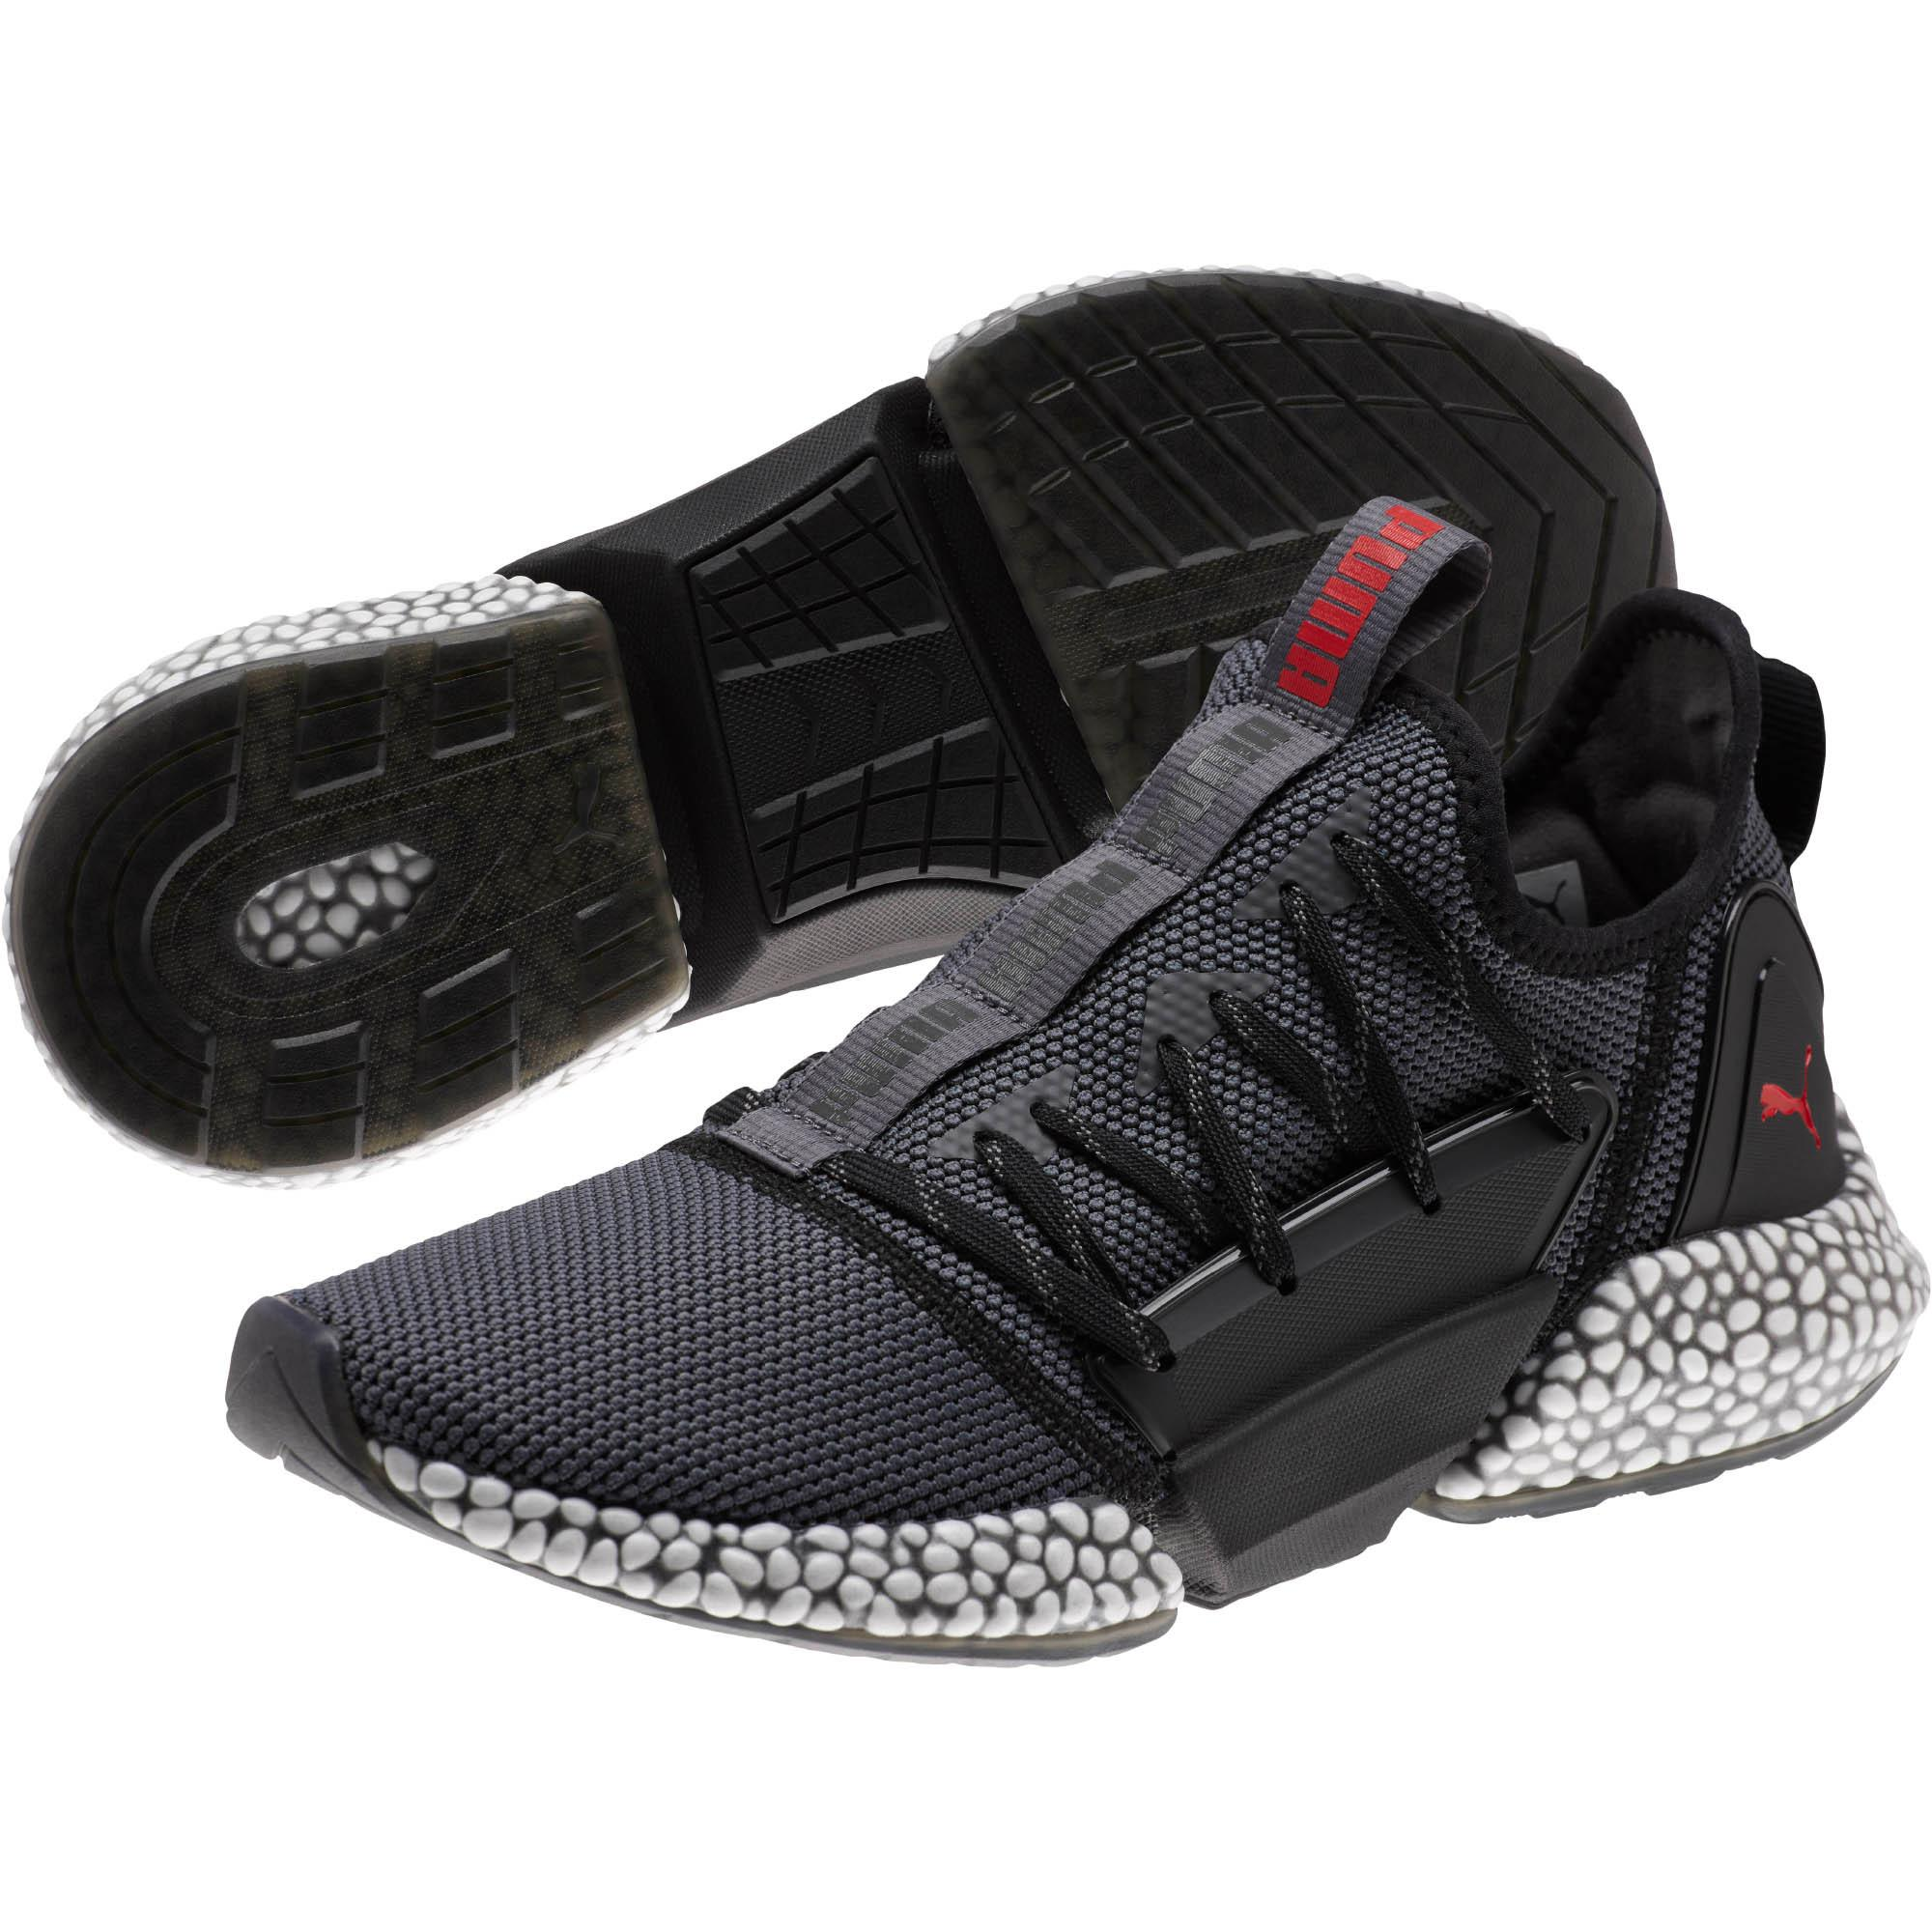 3f54a18758ec PUMA - Black Hybrid Rocket Runner Men s Running Shoes for Men - Lyst. View  fullscreen